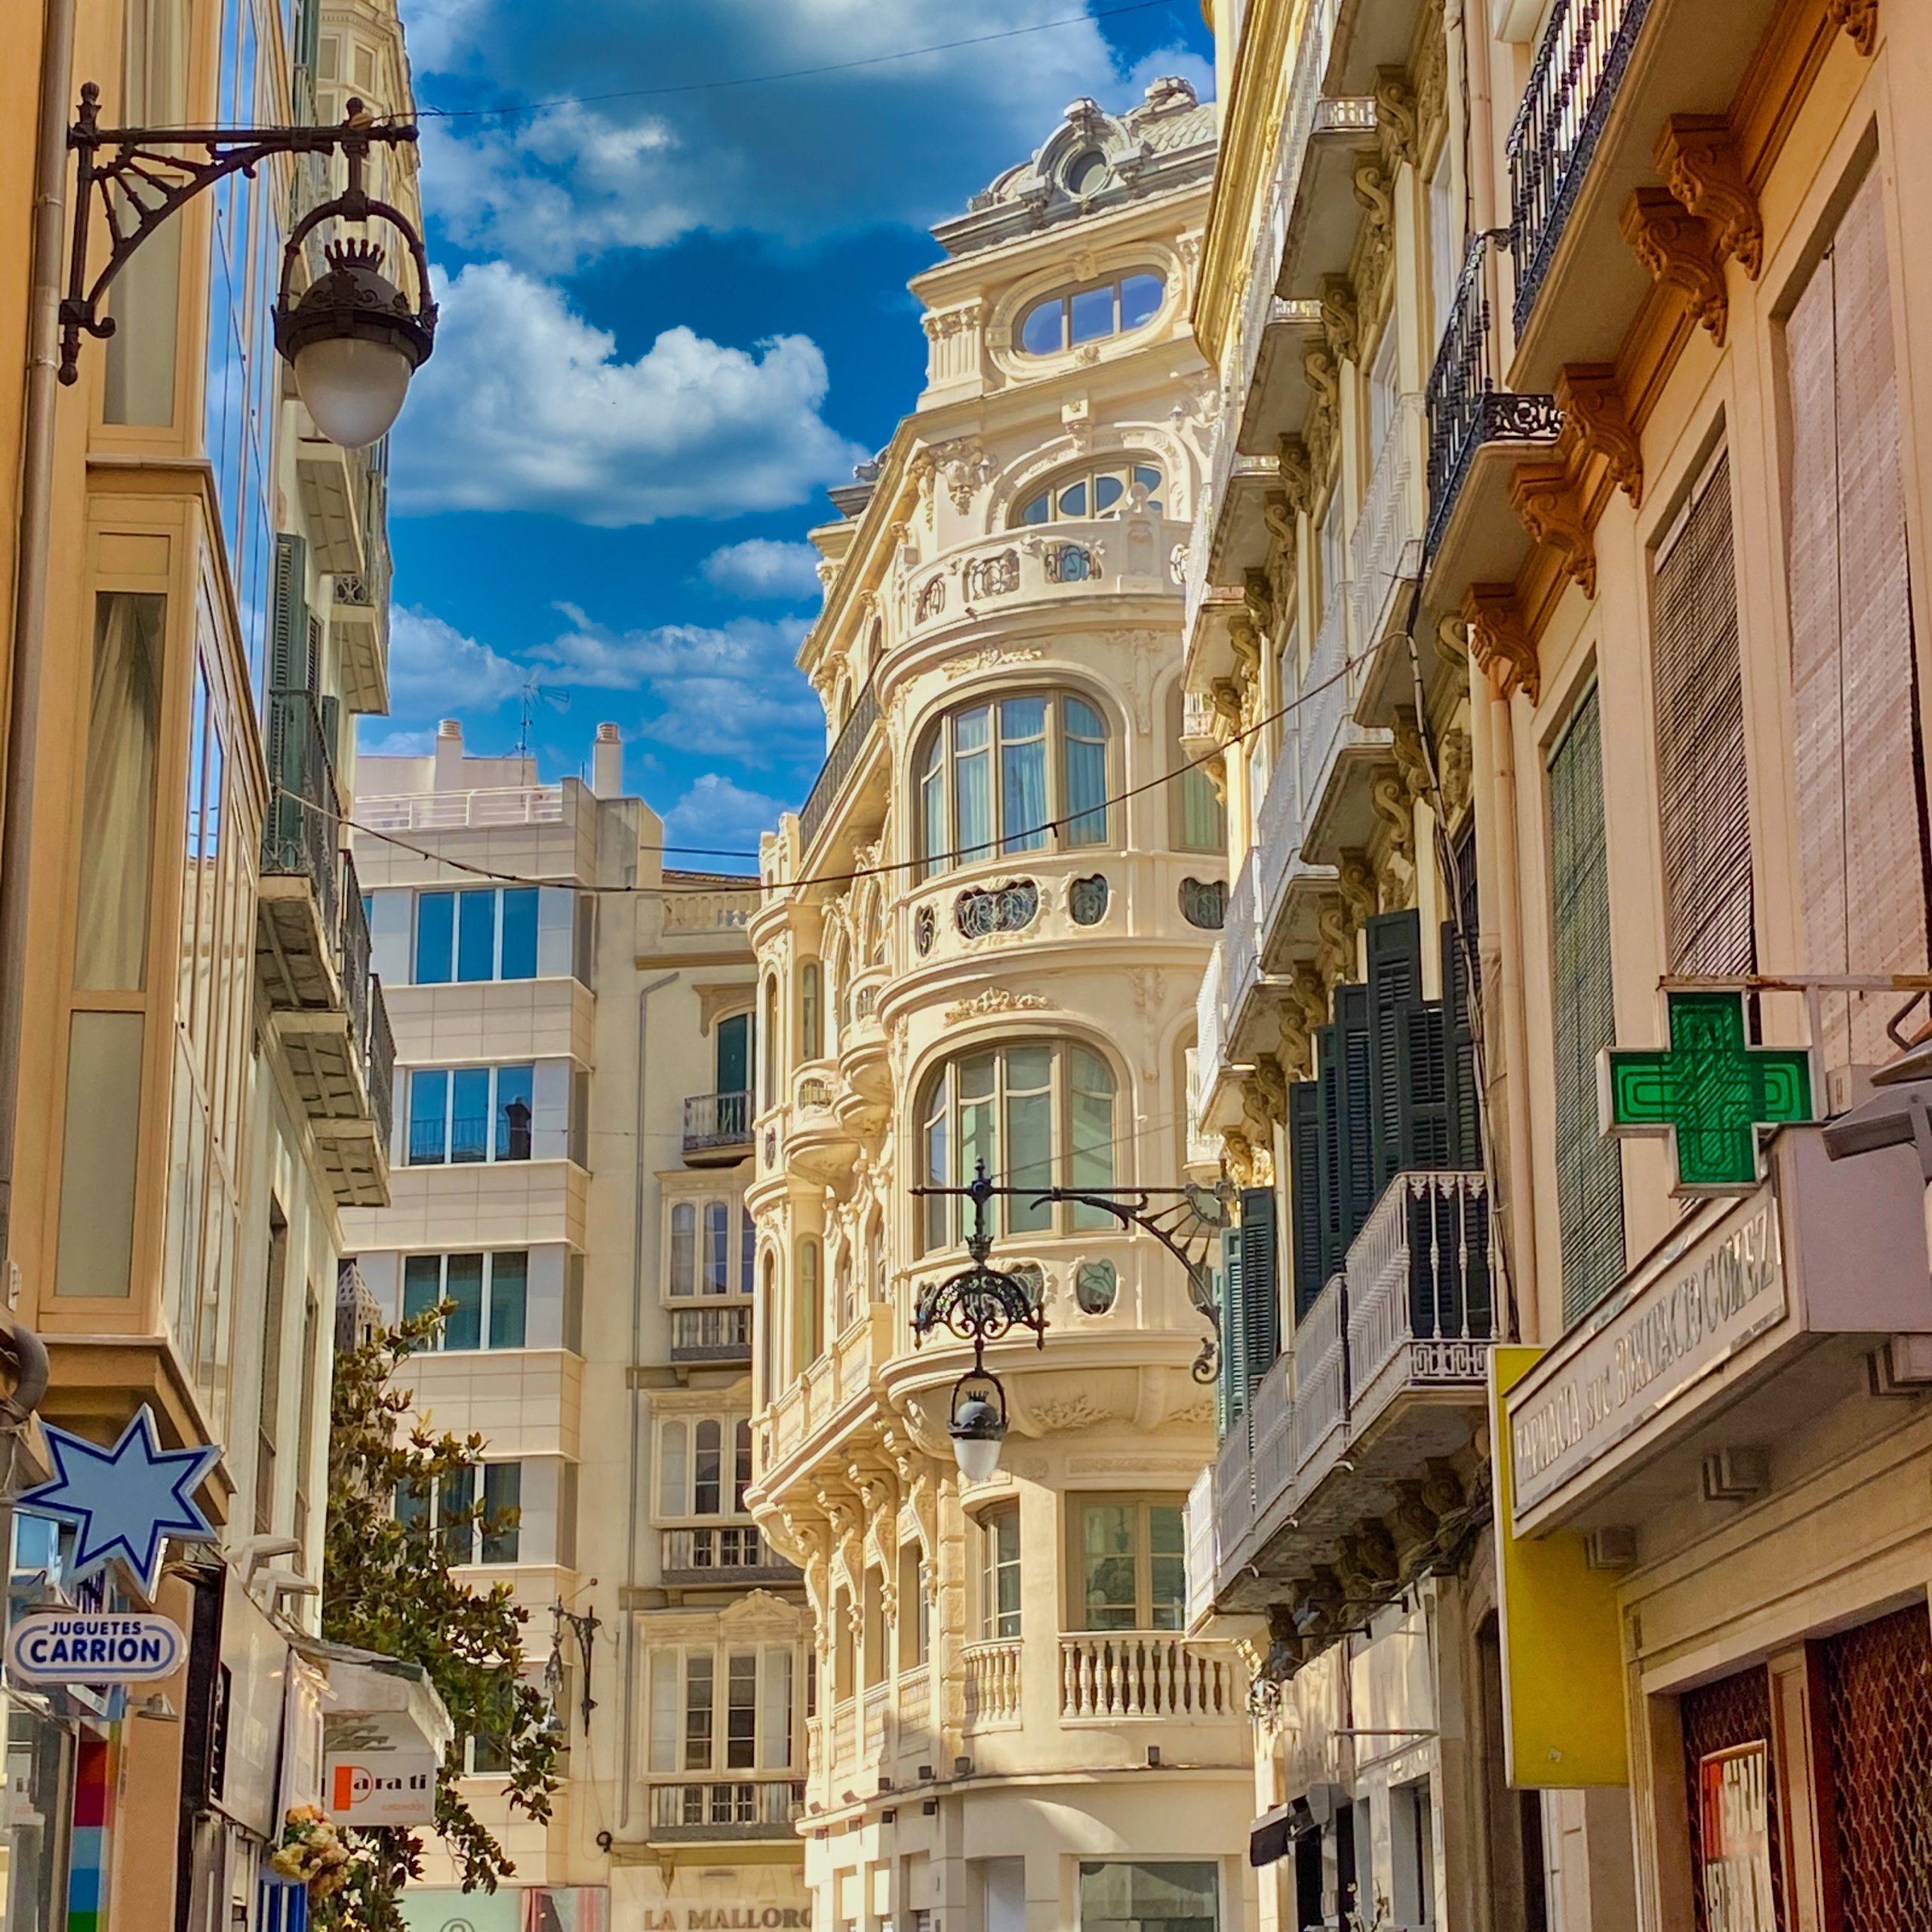 Calle San Juan in Malaga